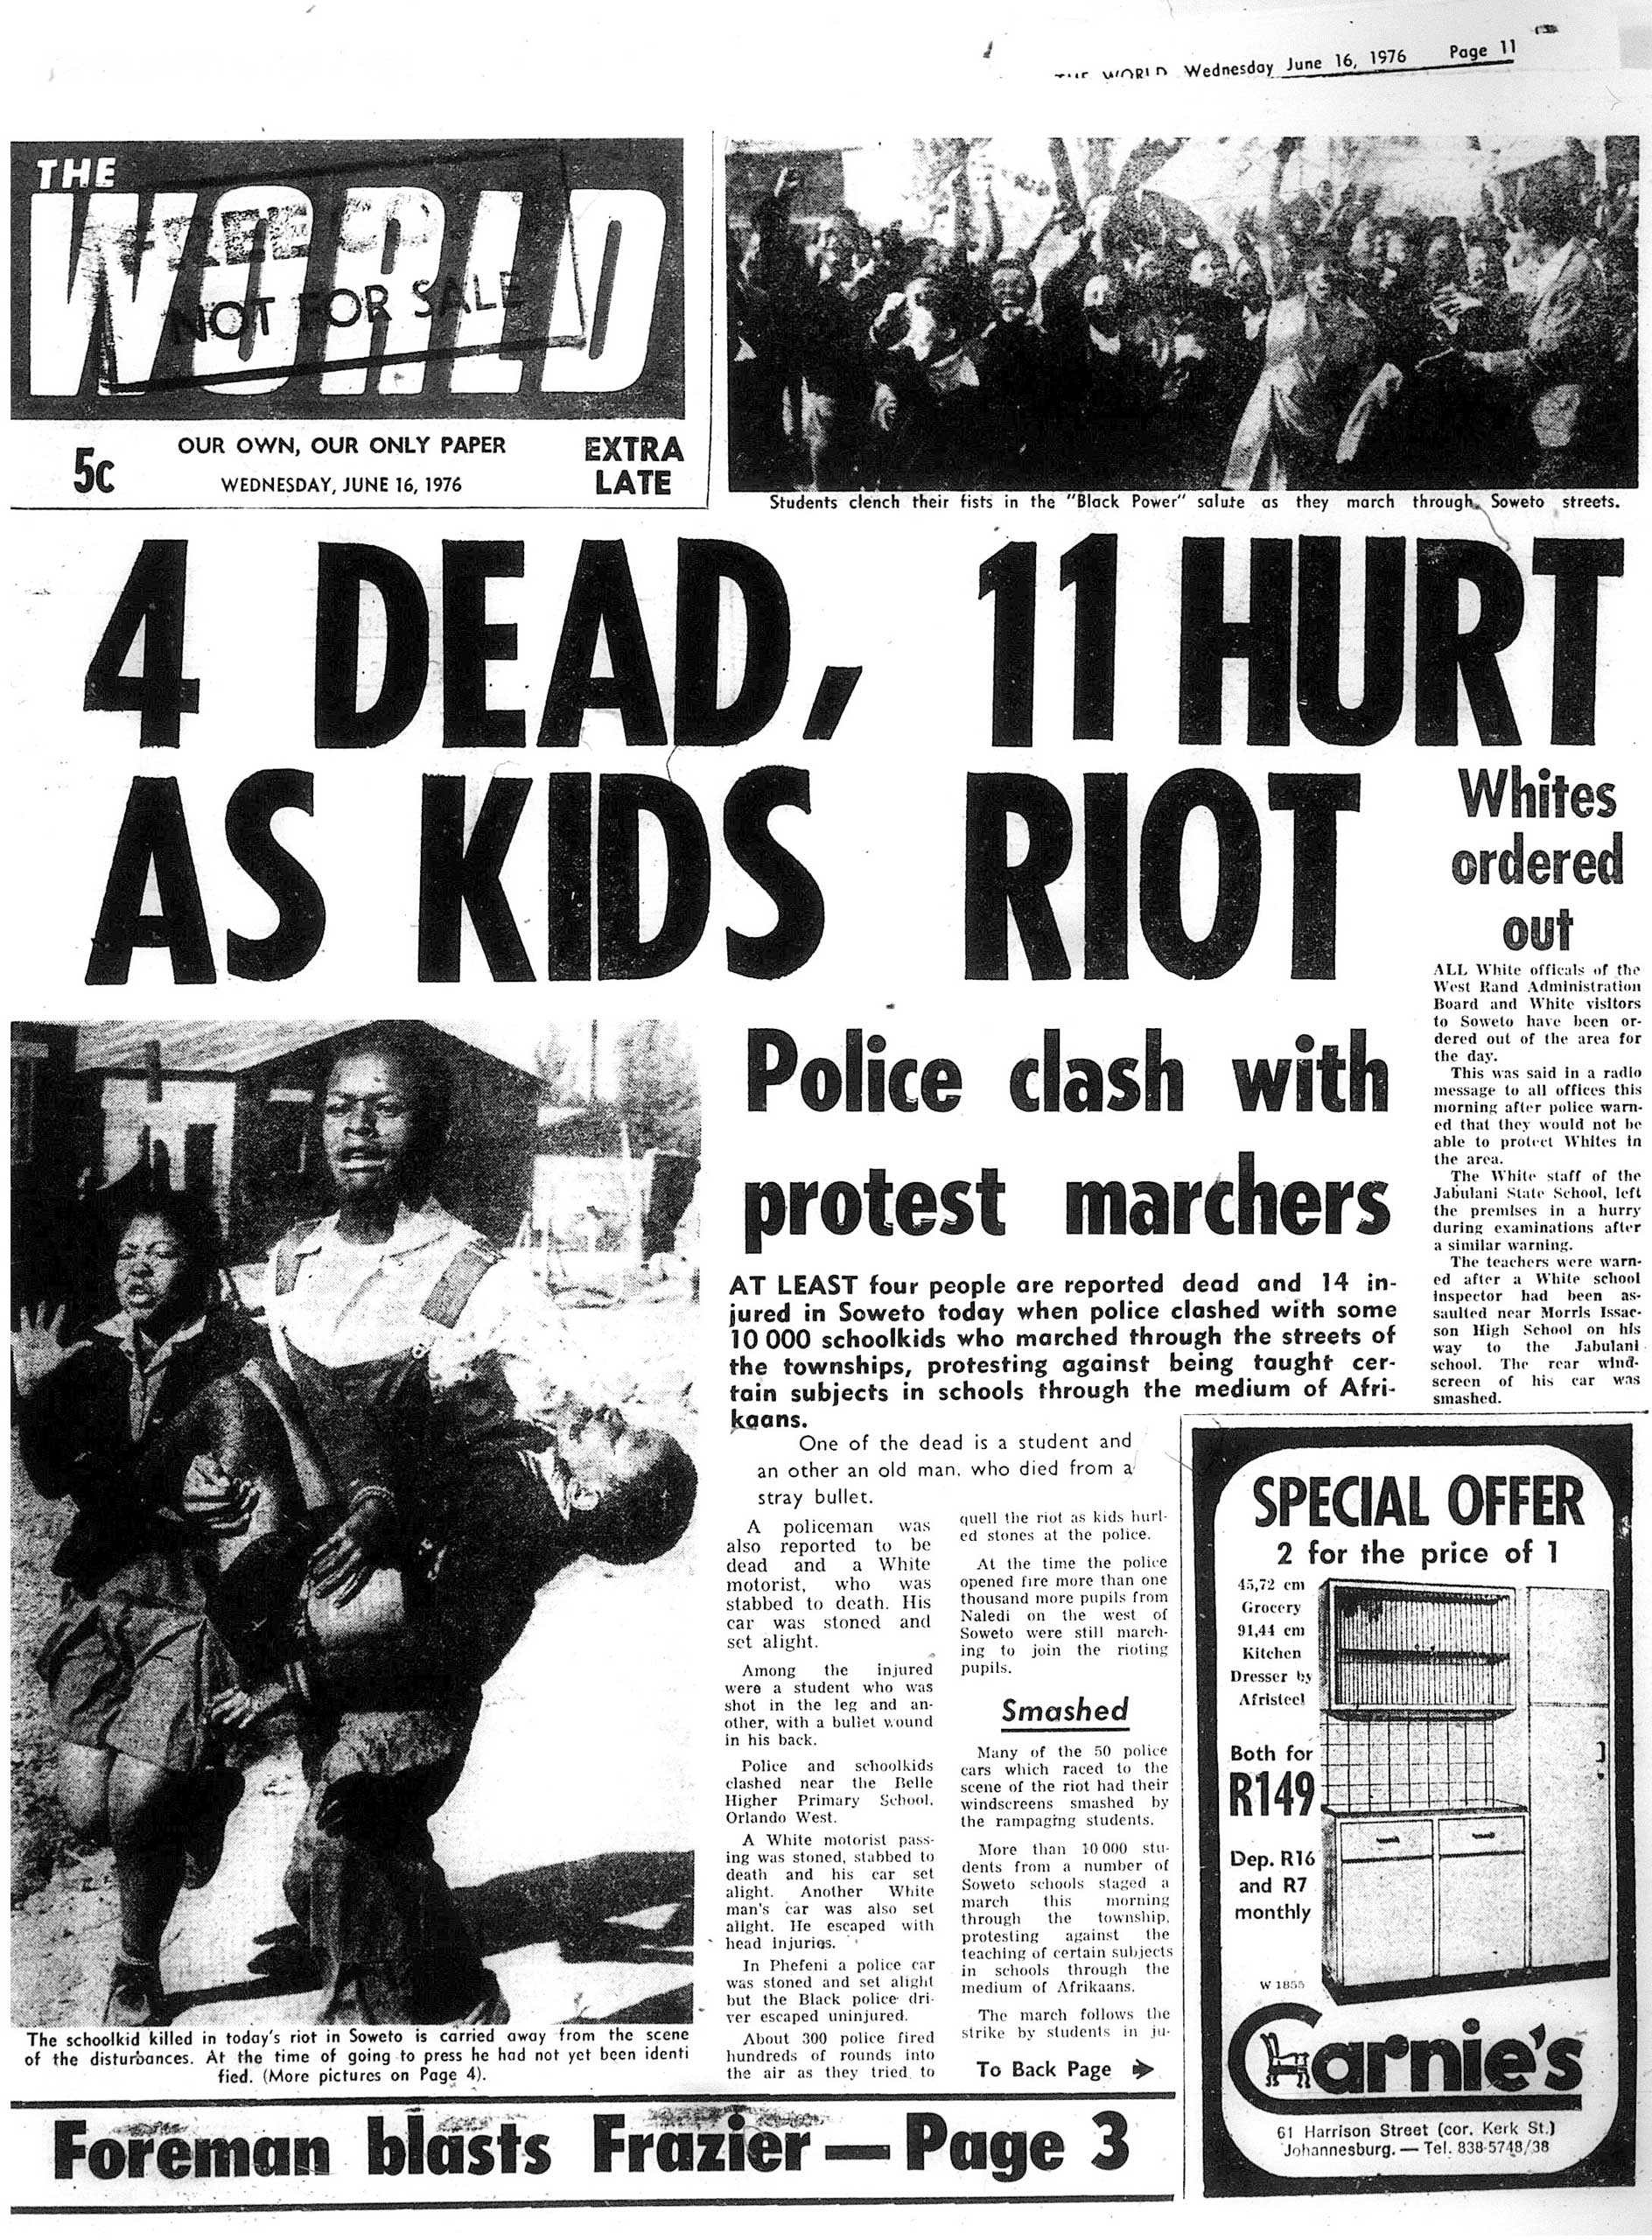 Sam Nzima's photo used in The World on June 16, 1976.